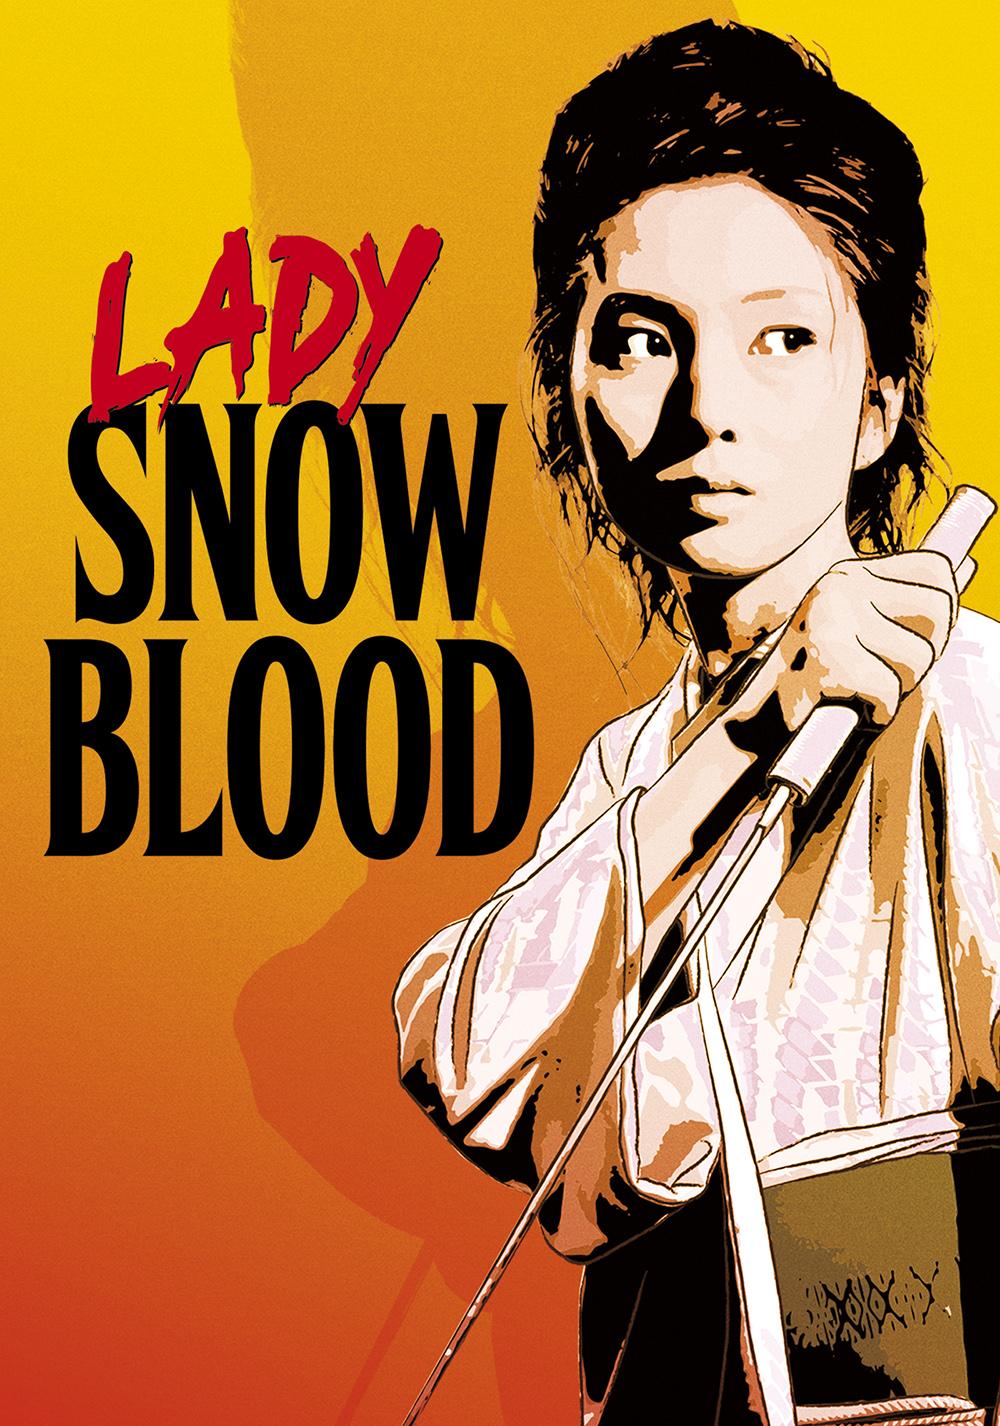 lady-snowblood-56cce2c86be79.jpg